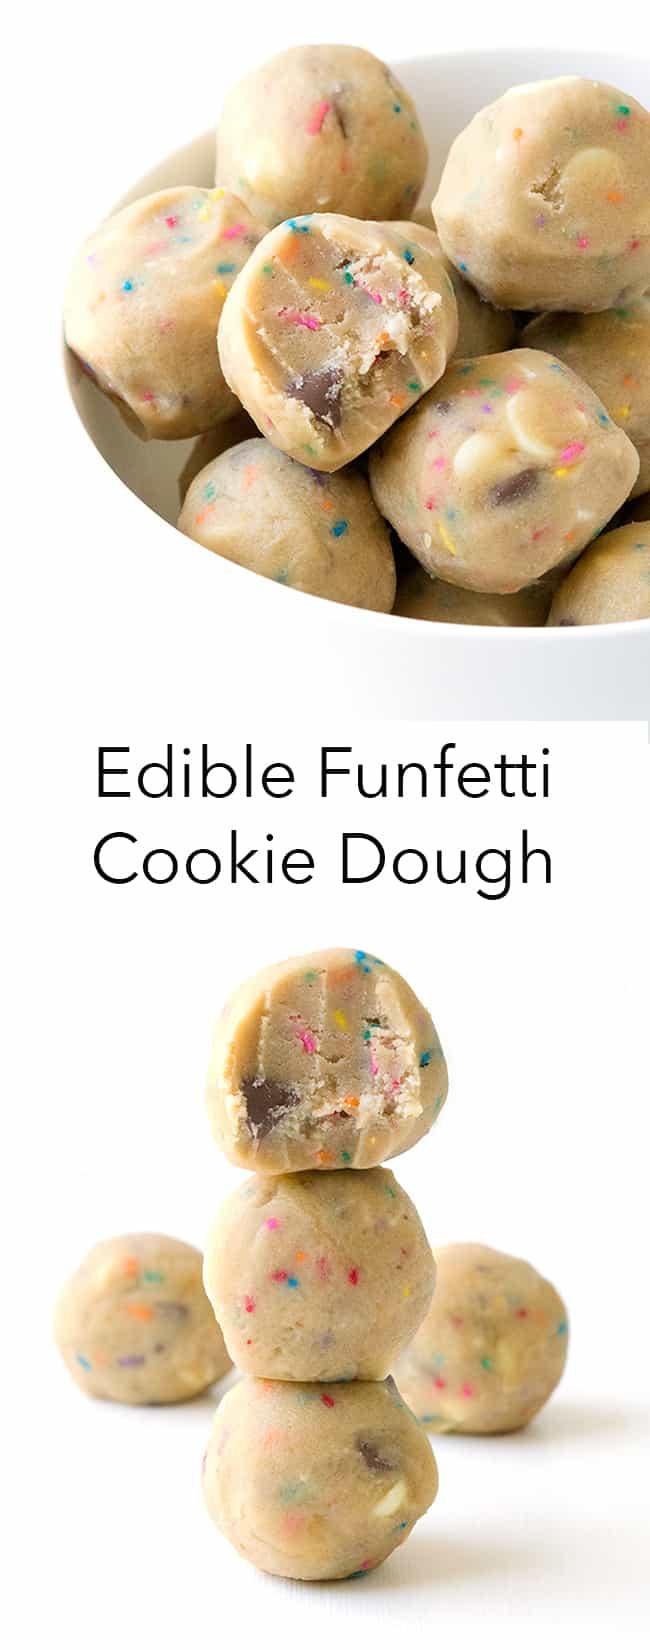 Edible Funfetti Cookie Dough | Sweetest Menu